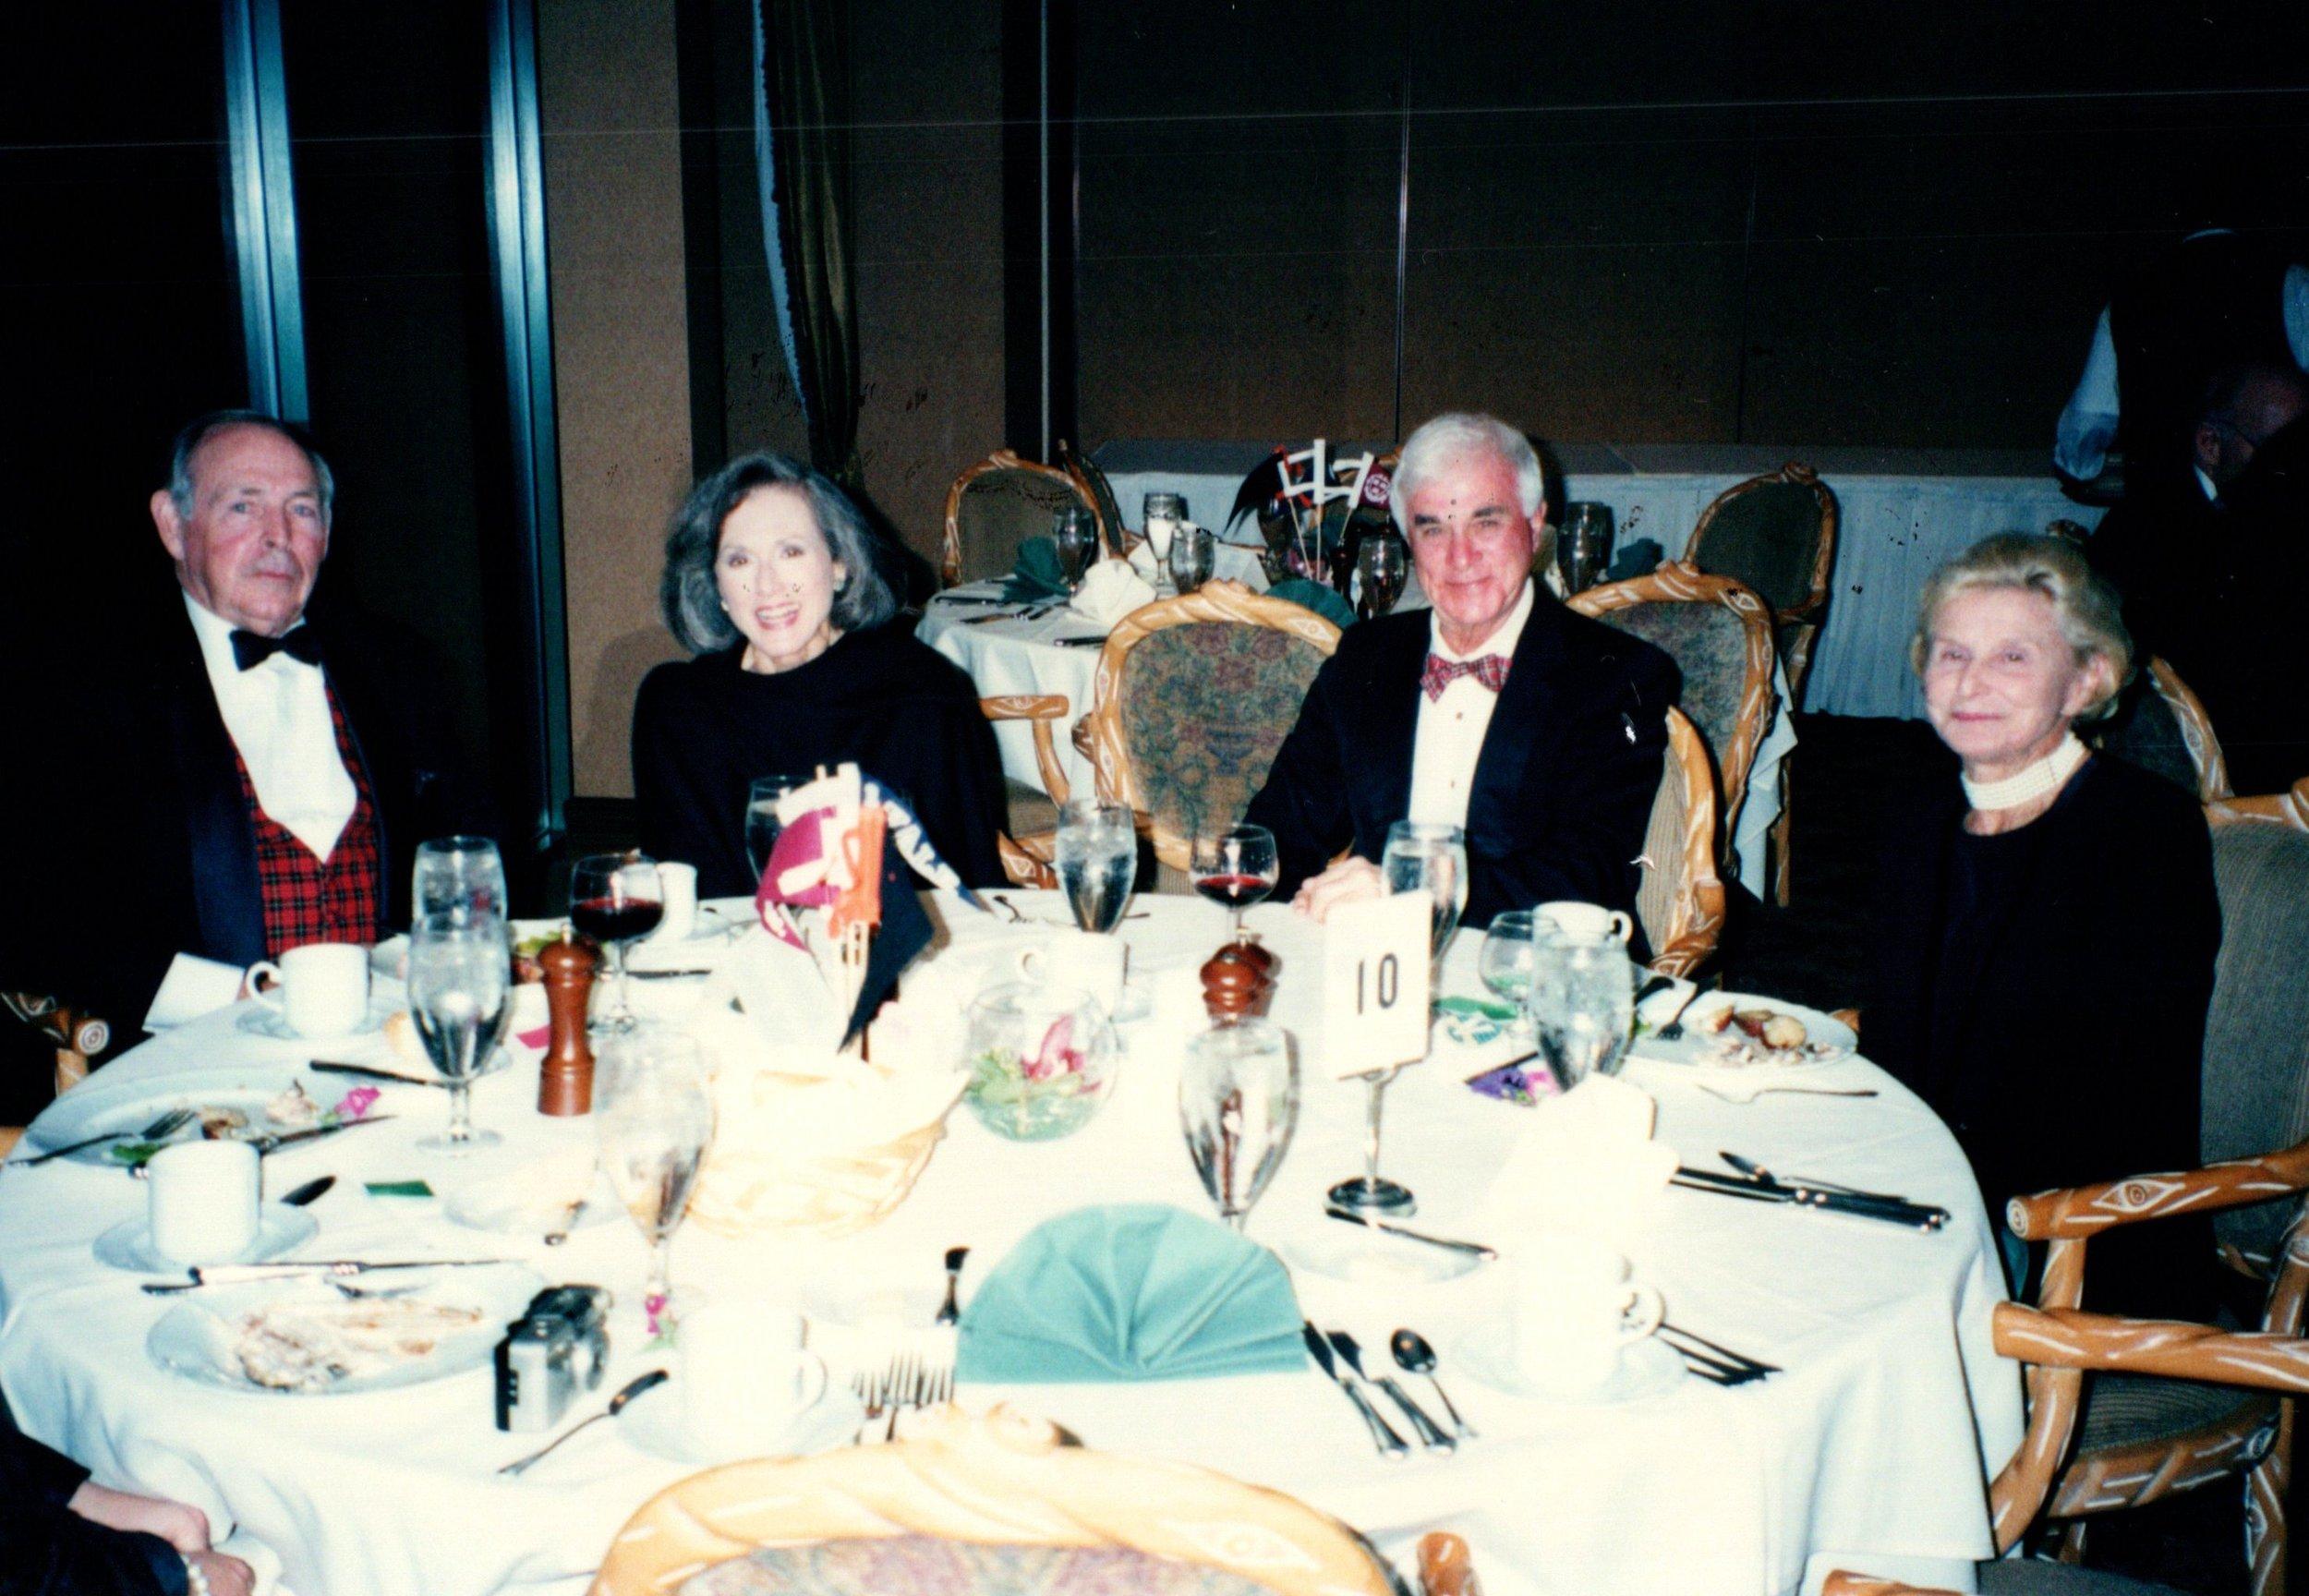 2_11_2002 - HYP DINNER DANCE - VINEYARD COUNTRY CLUB 1.jpg